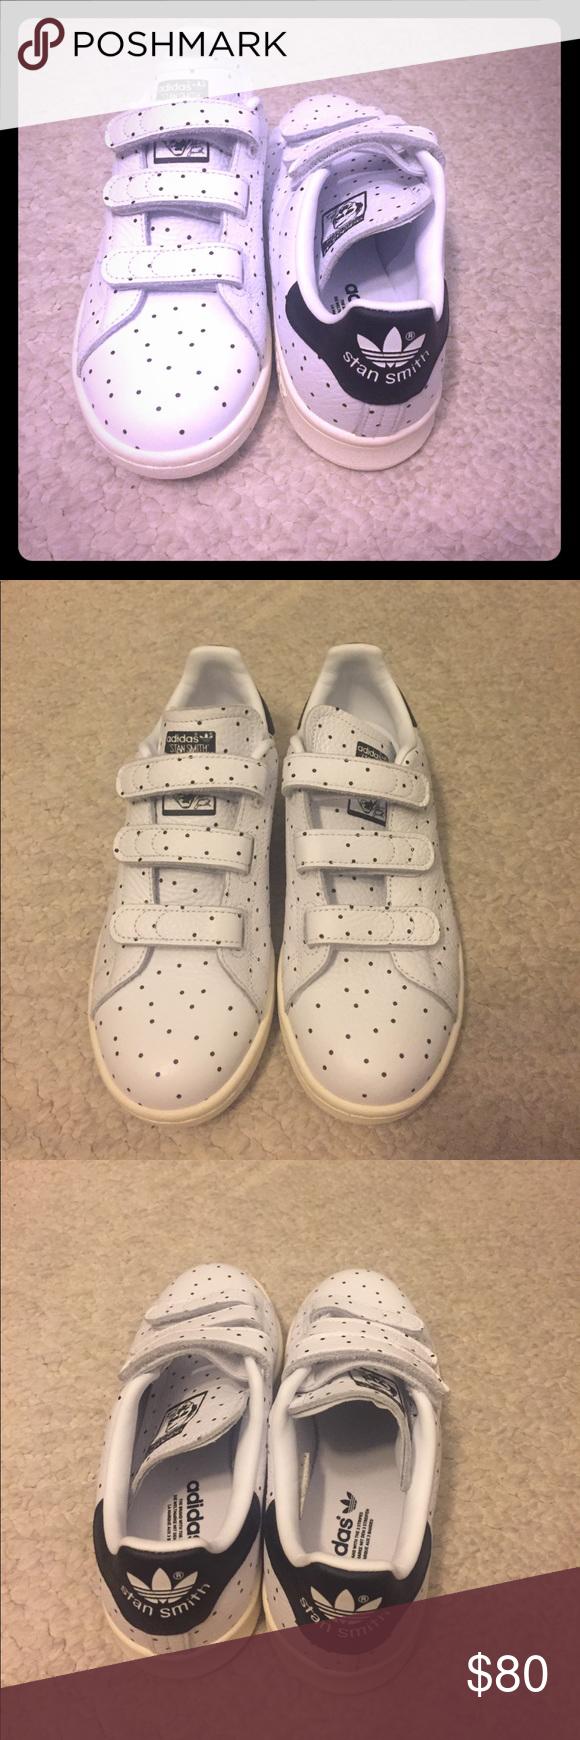 NWOT Stan Smith Velcro polka dot Adidas Size 5 but fits like